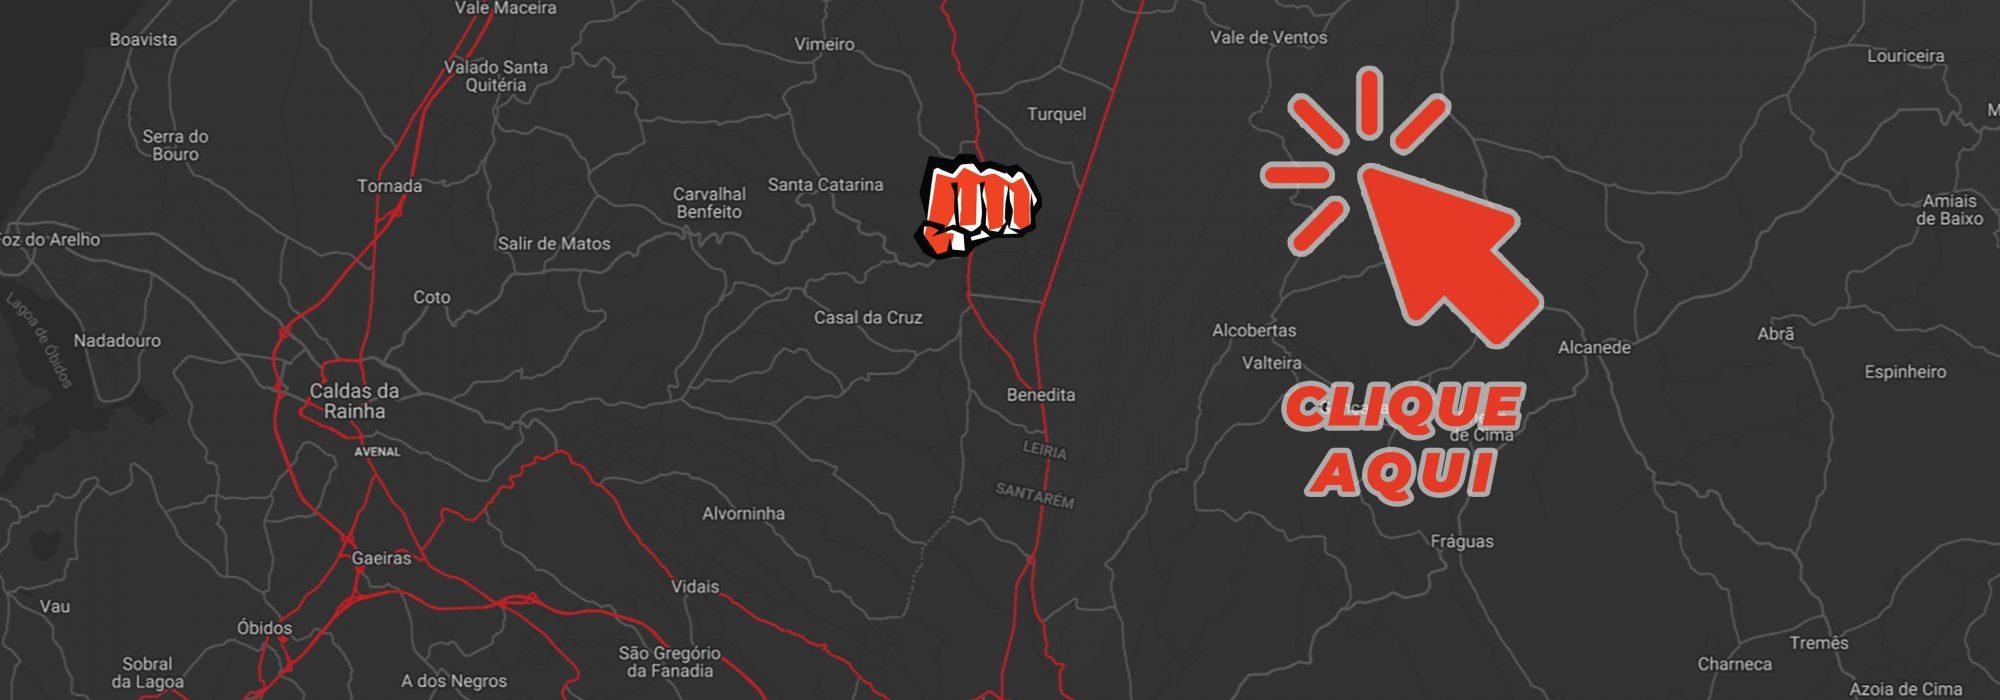 4k-map-benedita